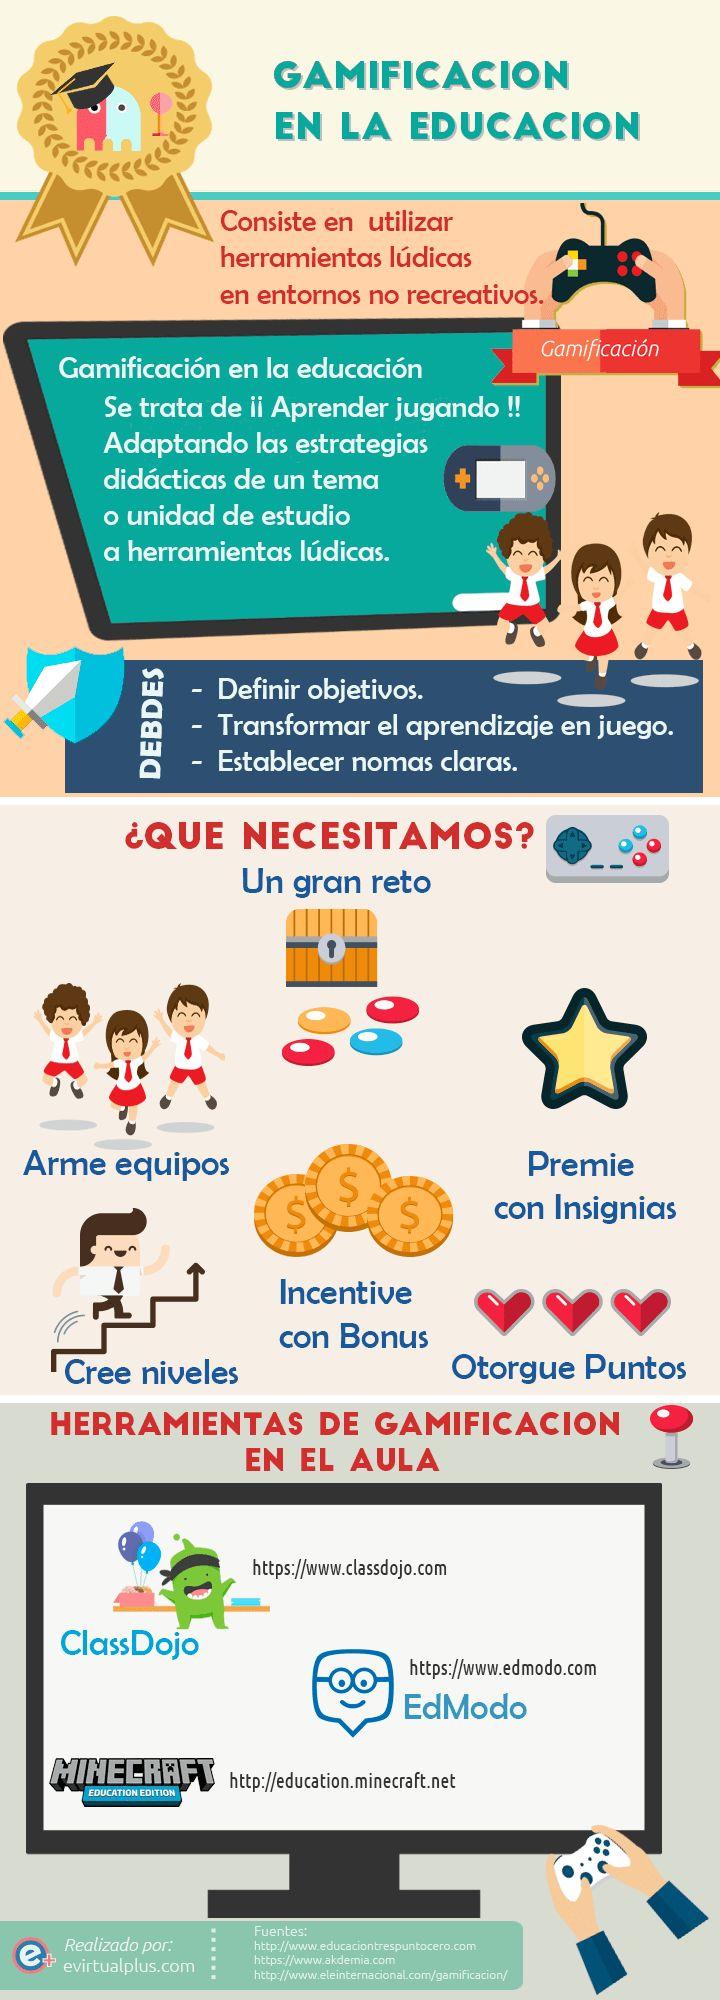 Gamificación en la Educación #educarlex #educaciónsocial